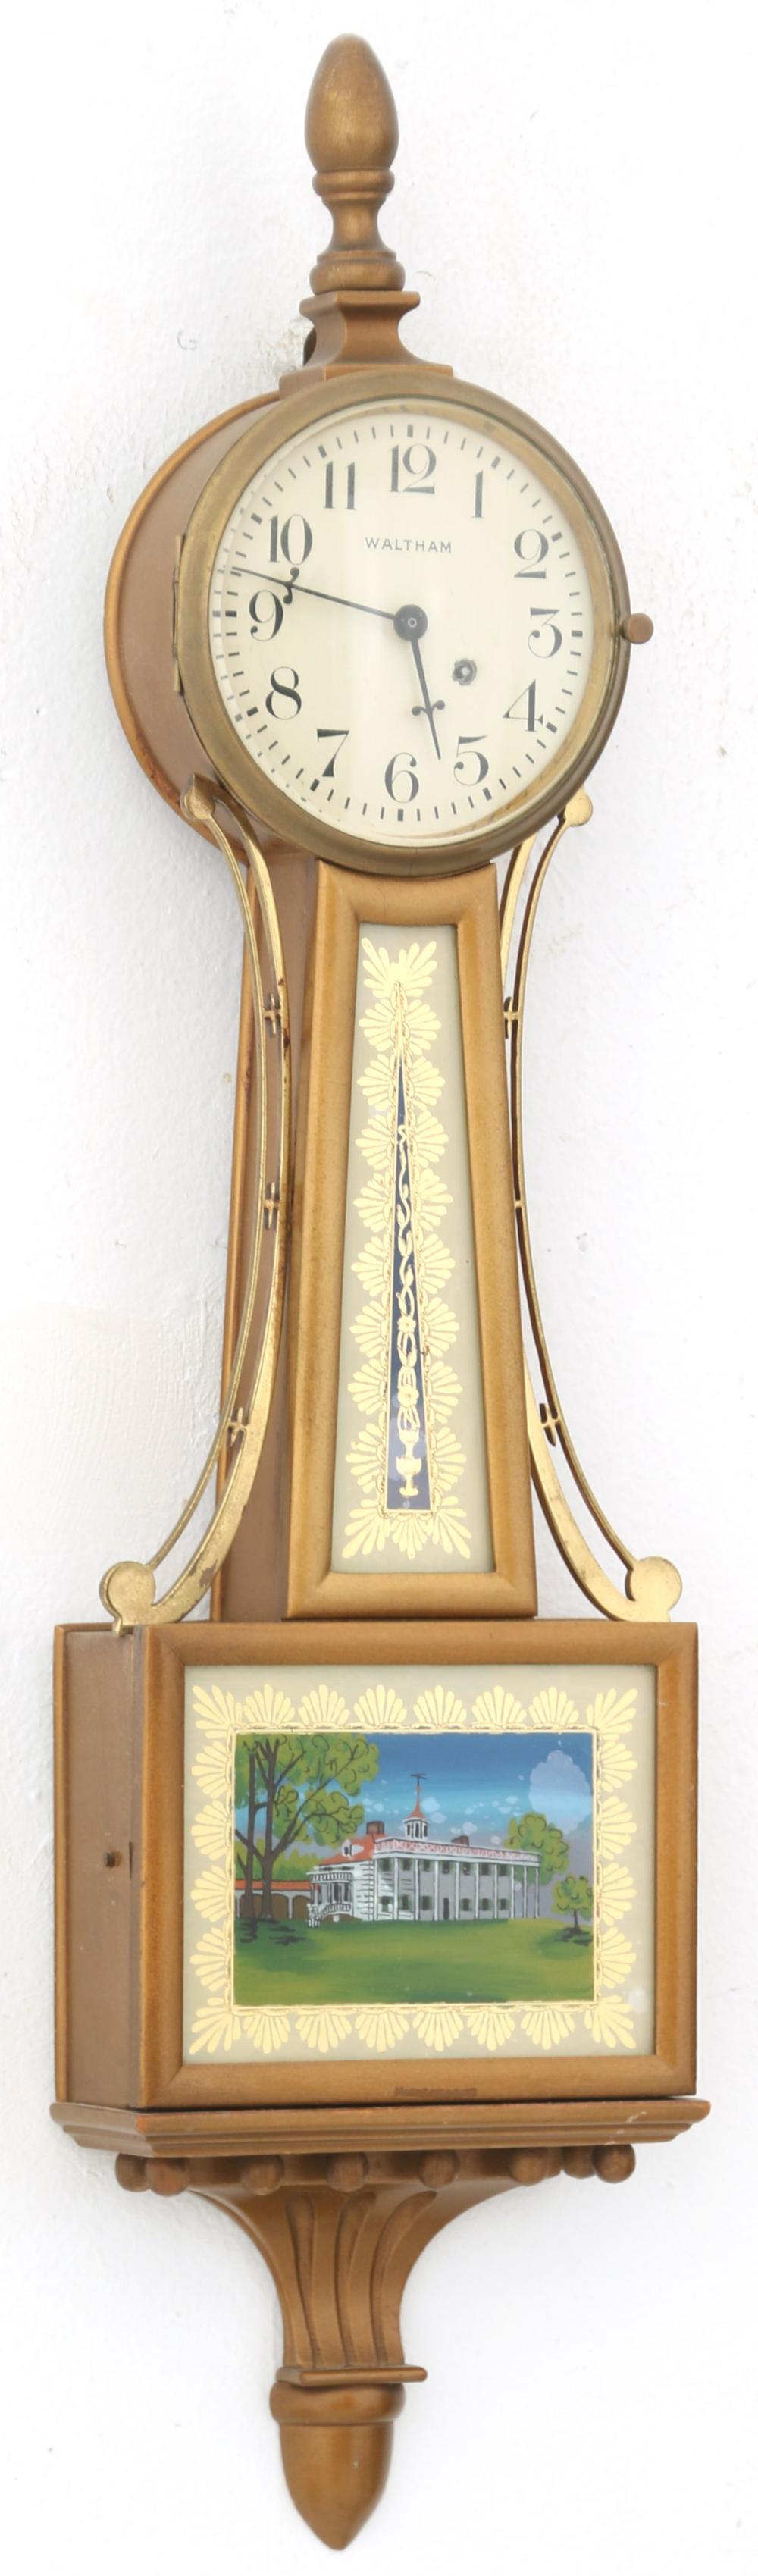 Waltham Miniature Presentation Banjo Clock